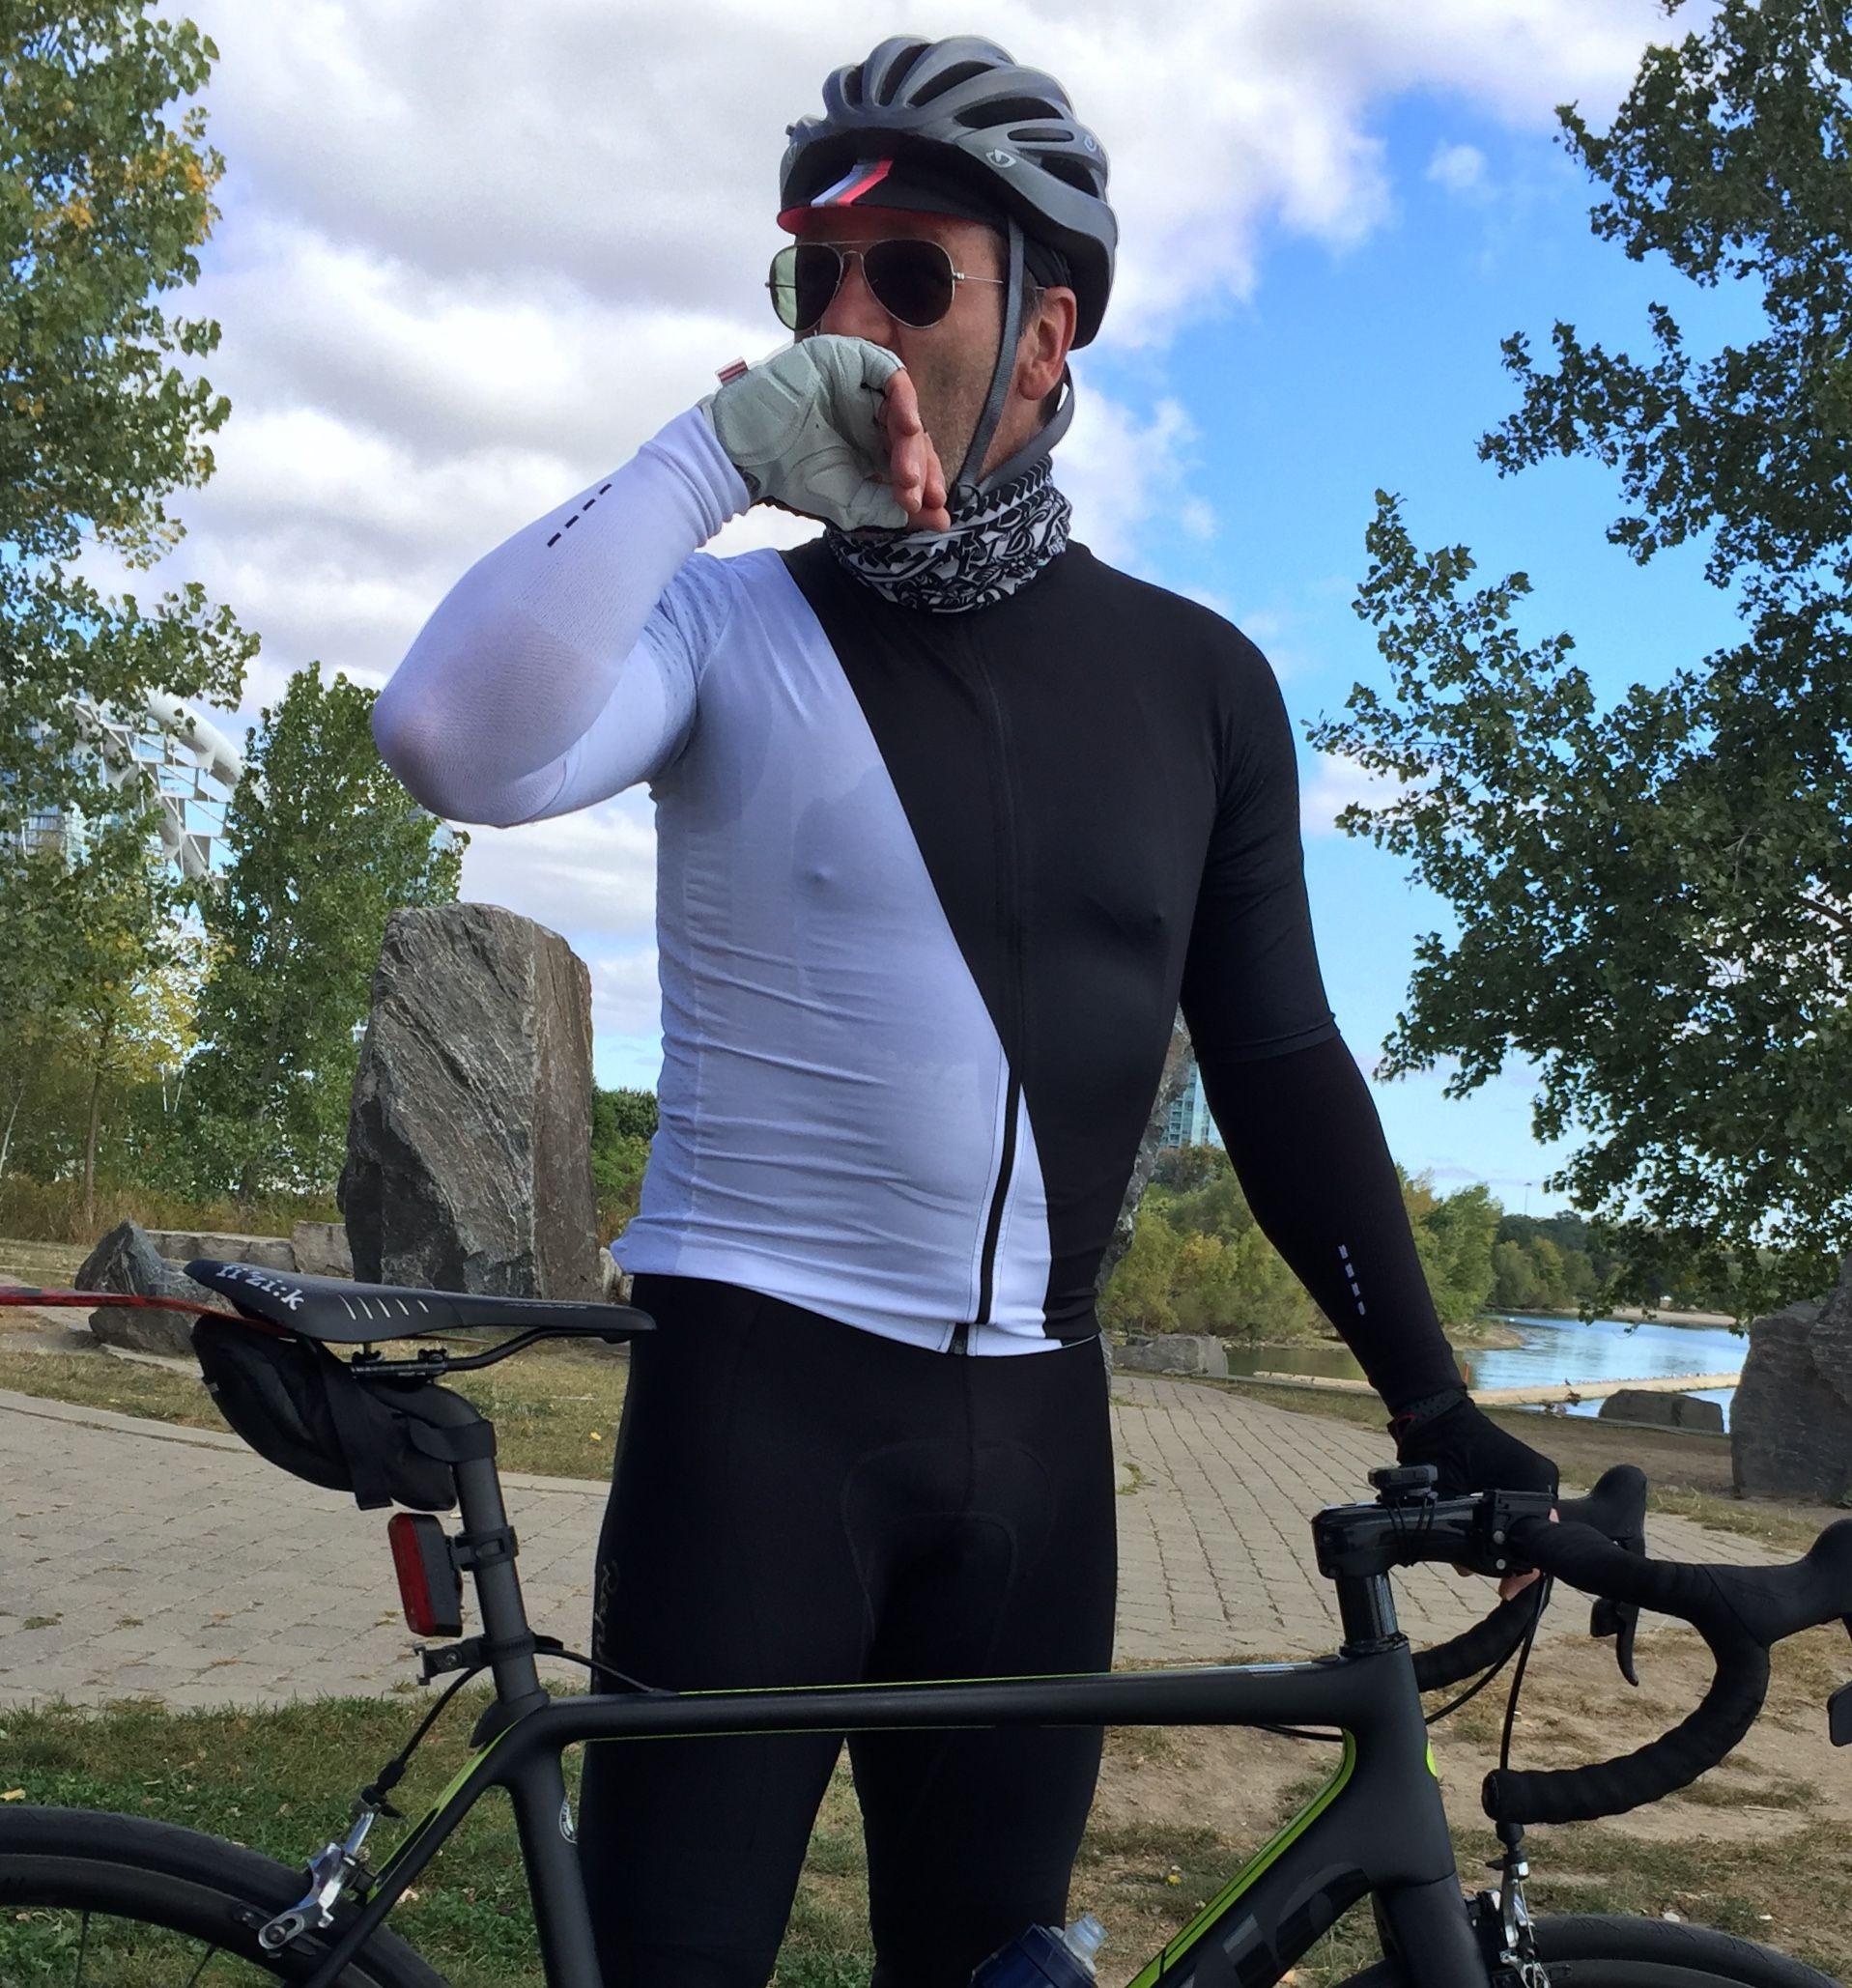 Pin by Pascal on Cyclist man Riding helmets, Fashion, Helmet